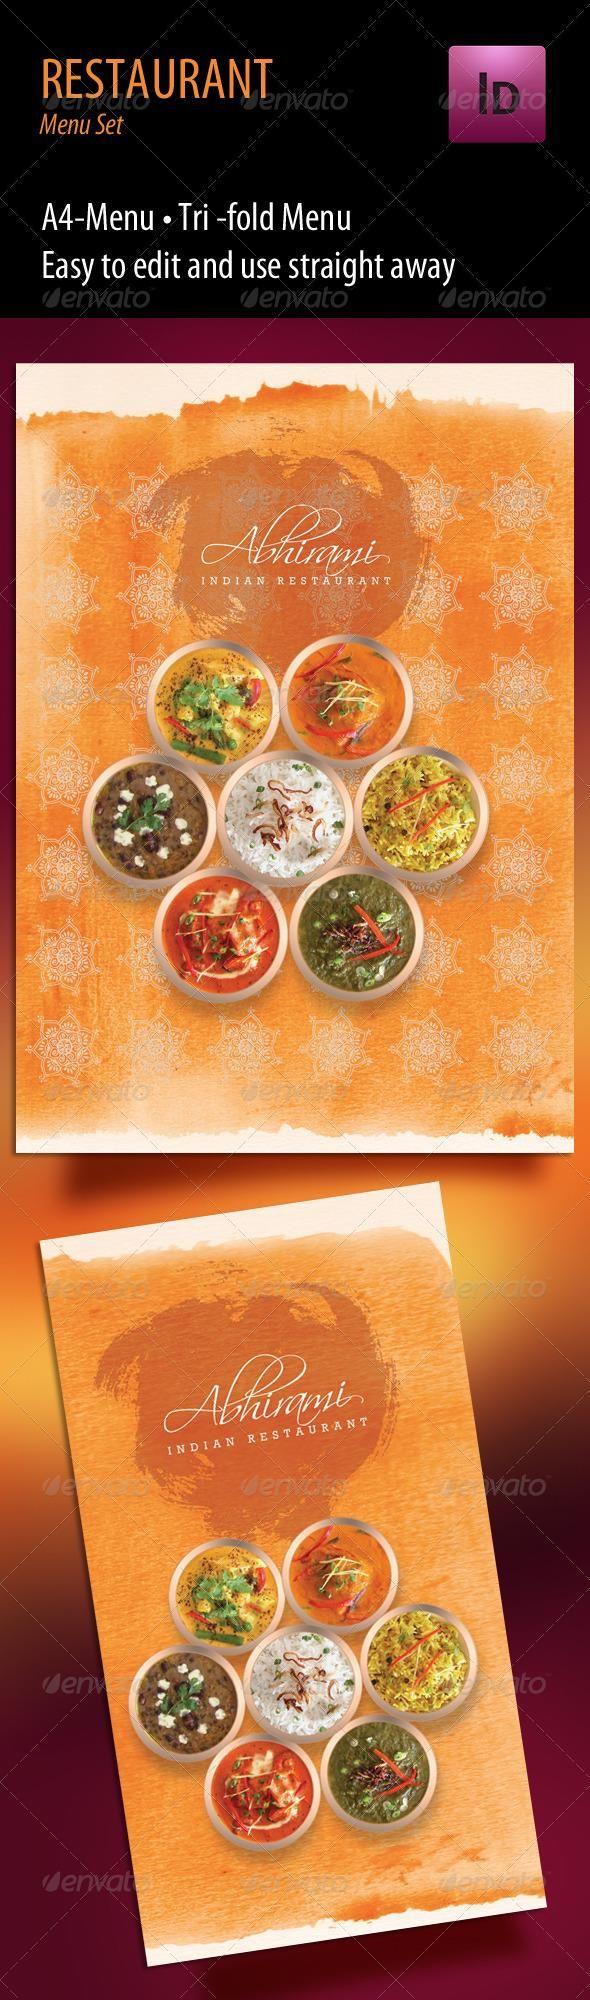 Indian Restaurant Menu set - A4 & Trifold